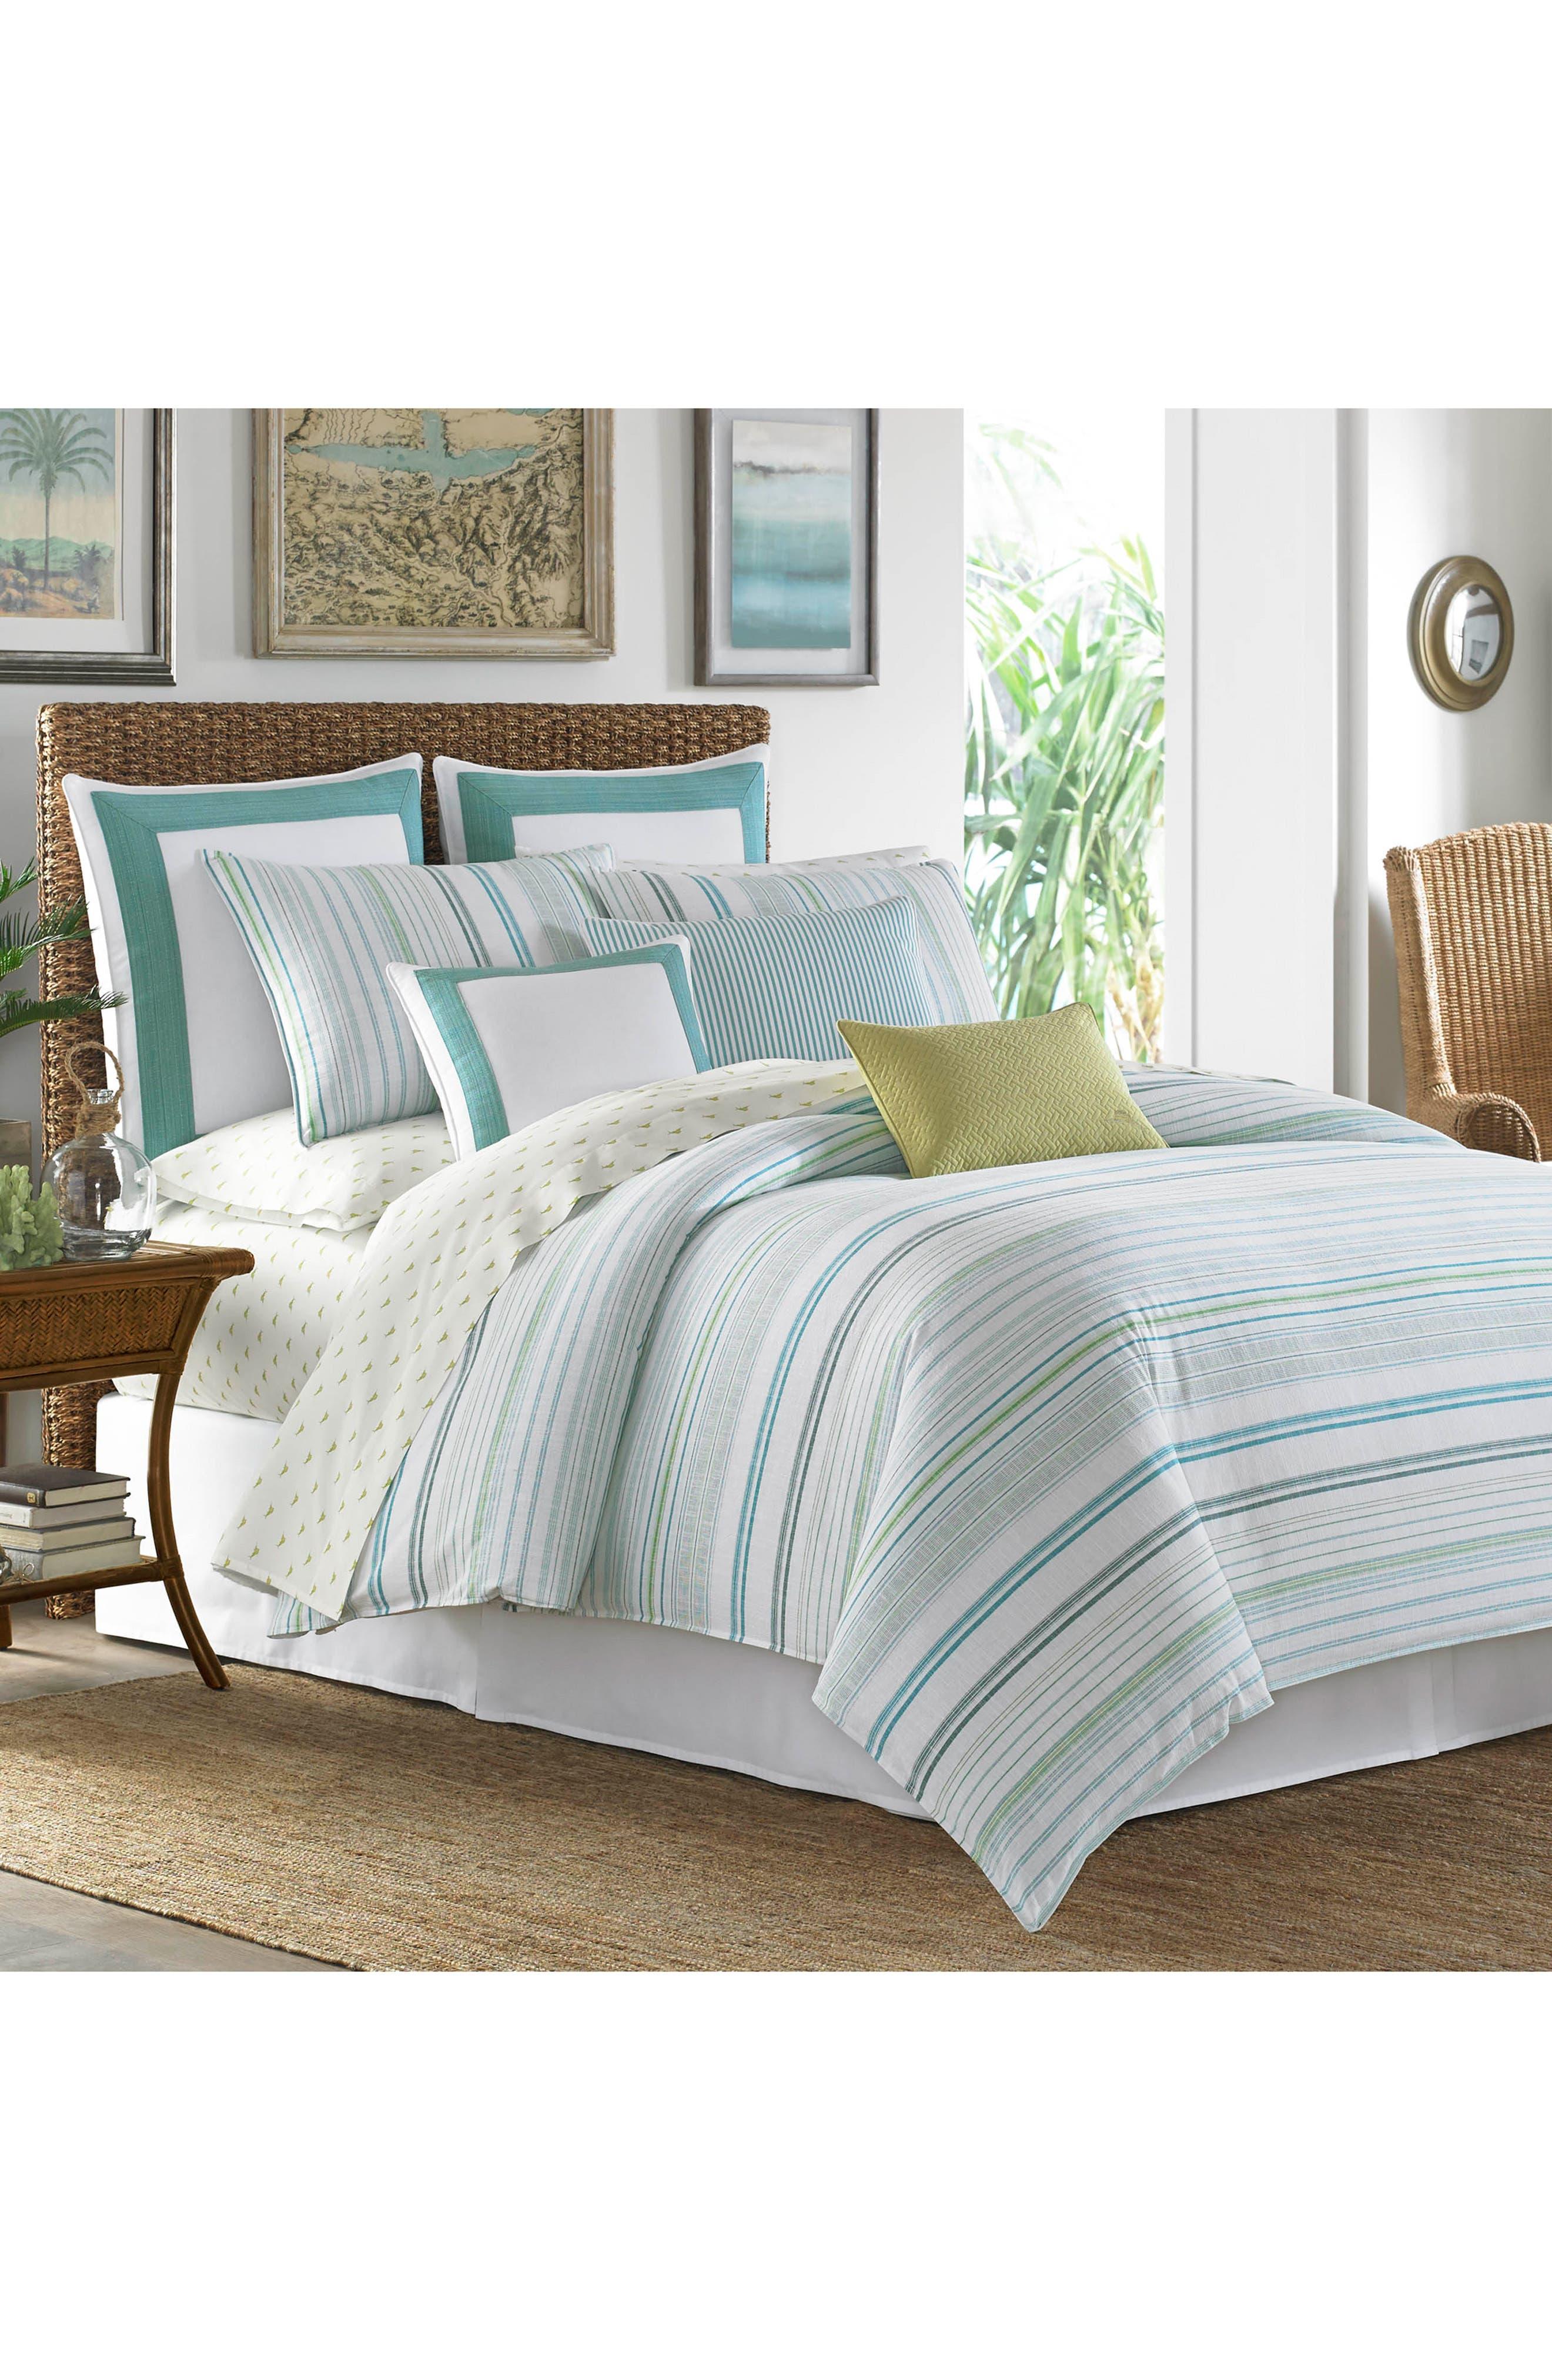 La Scala Breezer Comforter, Sham & Bed Skirt Set,                             Alternate thumbnail 2, color,                             440